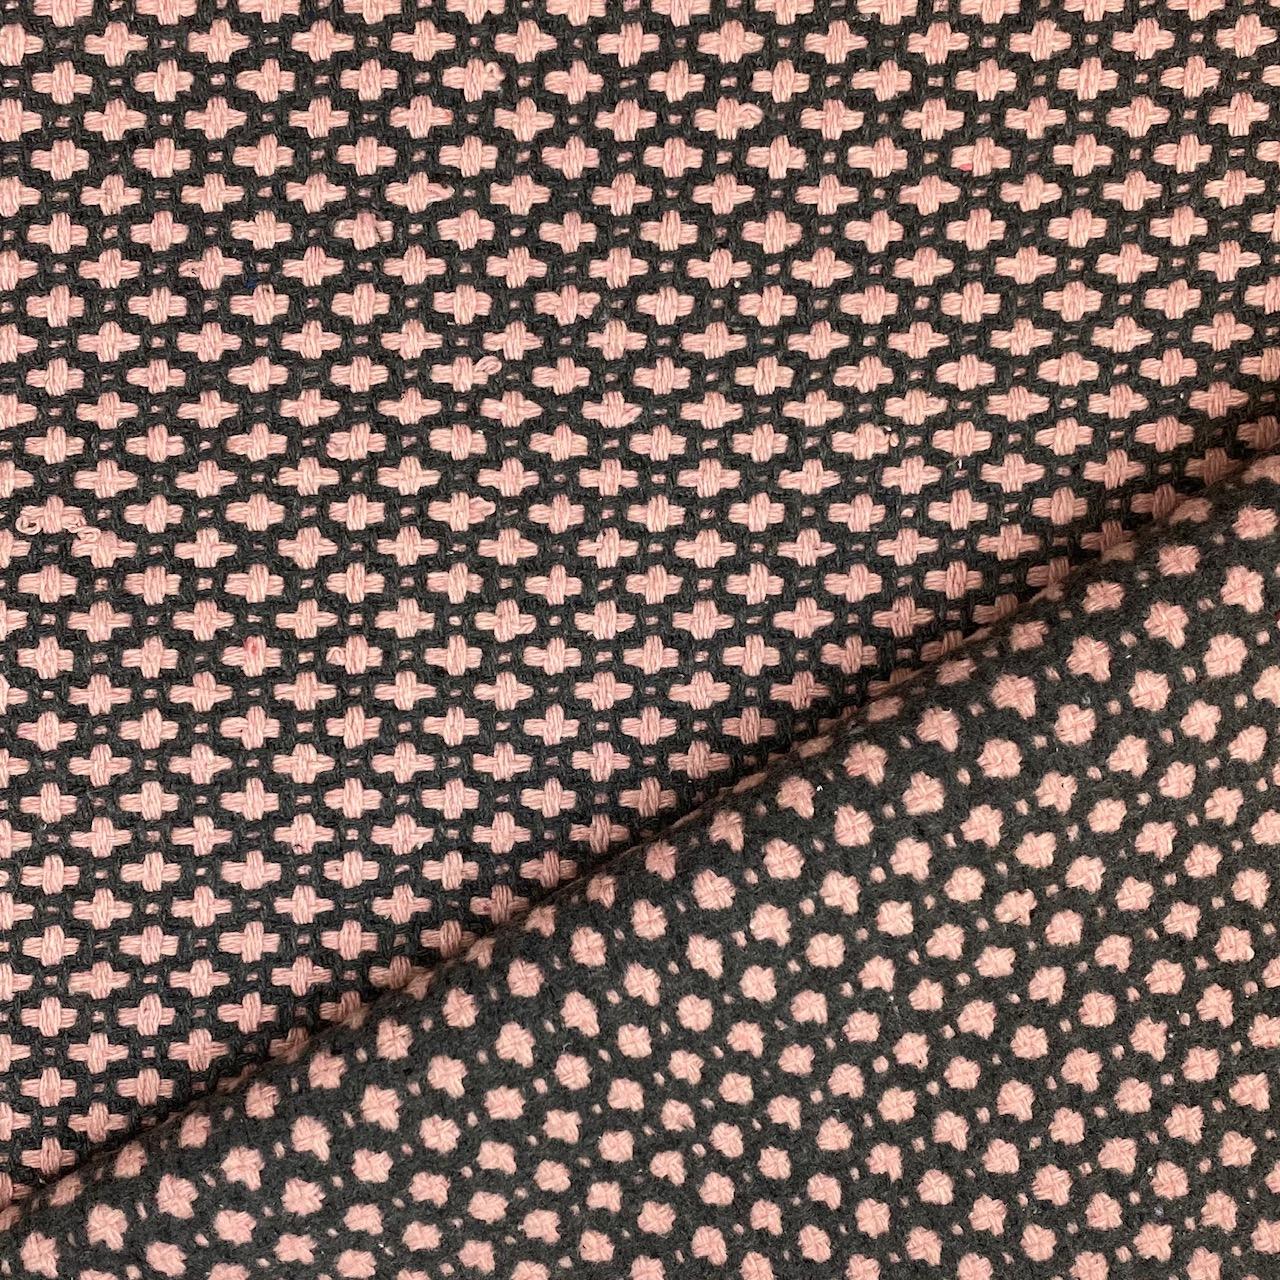 Mantelstoff Woll-Mix, altrosa/grau. Art. 486006